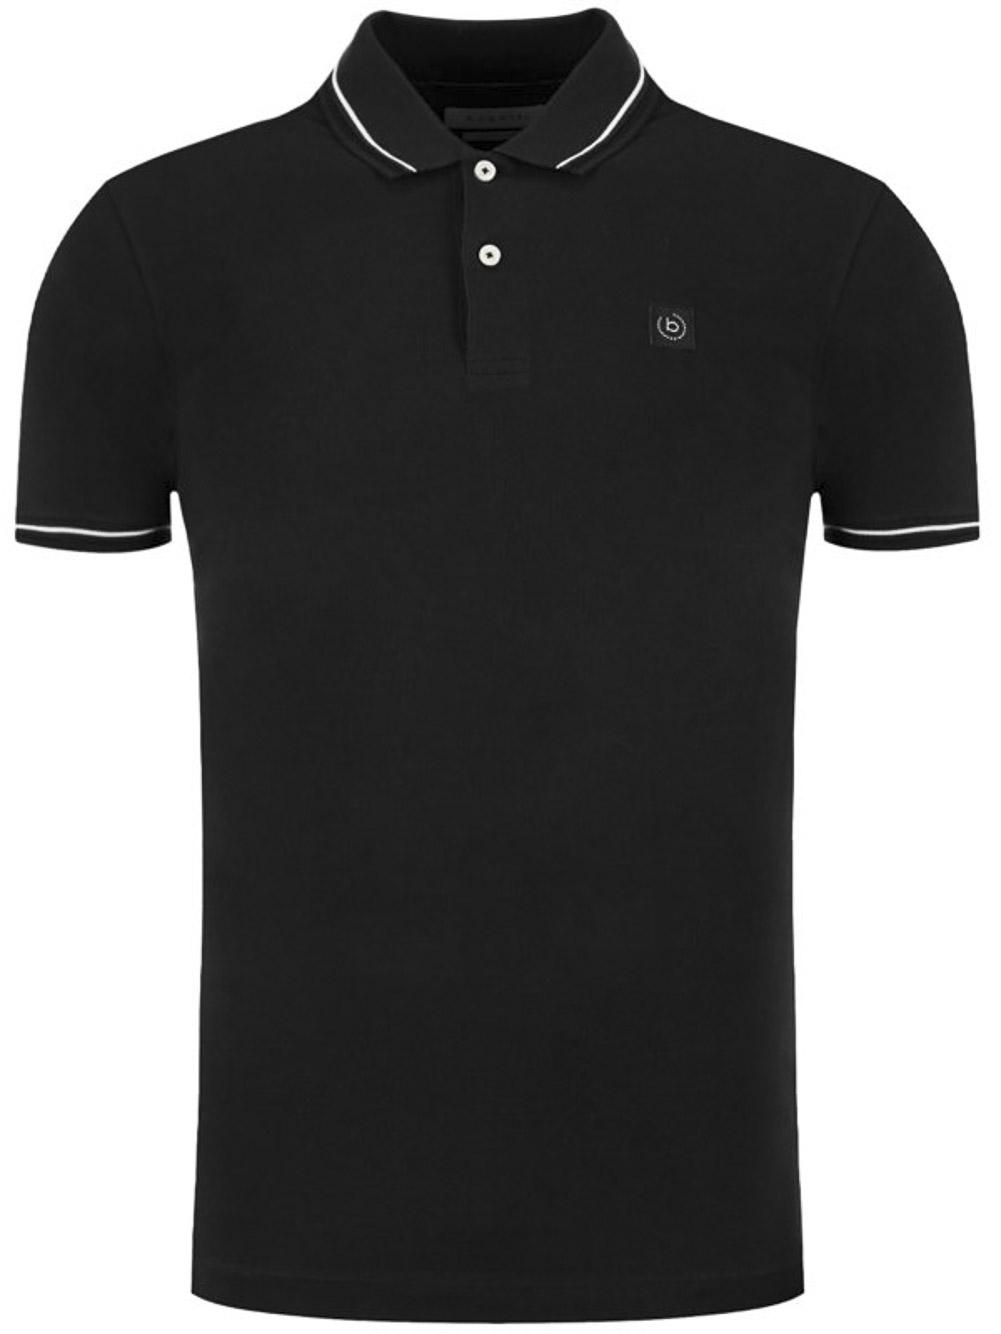 BUGATTI Μπλούζα Polo 8150 55001-290 ΜΑΥΡΟ